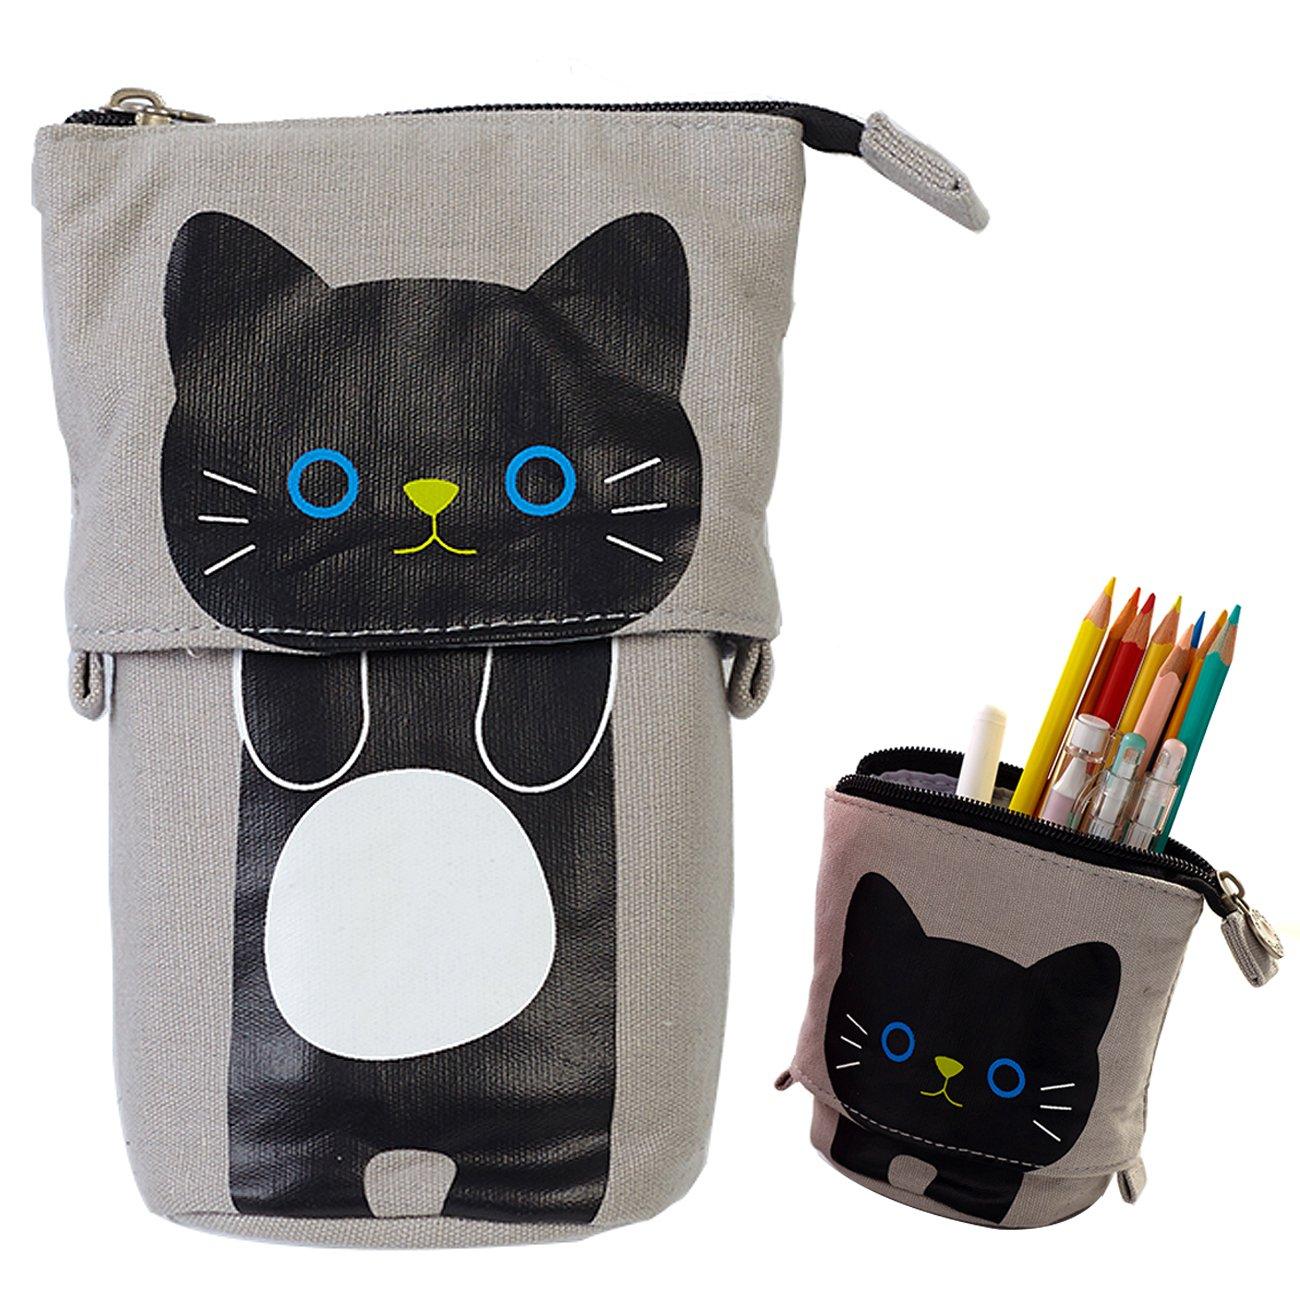 iSuperb Transformer Stand Store Pencil Holder Canvas+PU Cartoon Cute Cat Telescopic Pencil Pouch Bag Stationery Pen Case Box with Zipper Closure 7.5 x 4.9 x 3.0inch/4.1x 3.0inch (Pink)